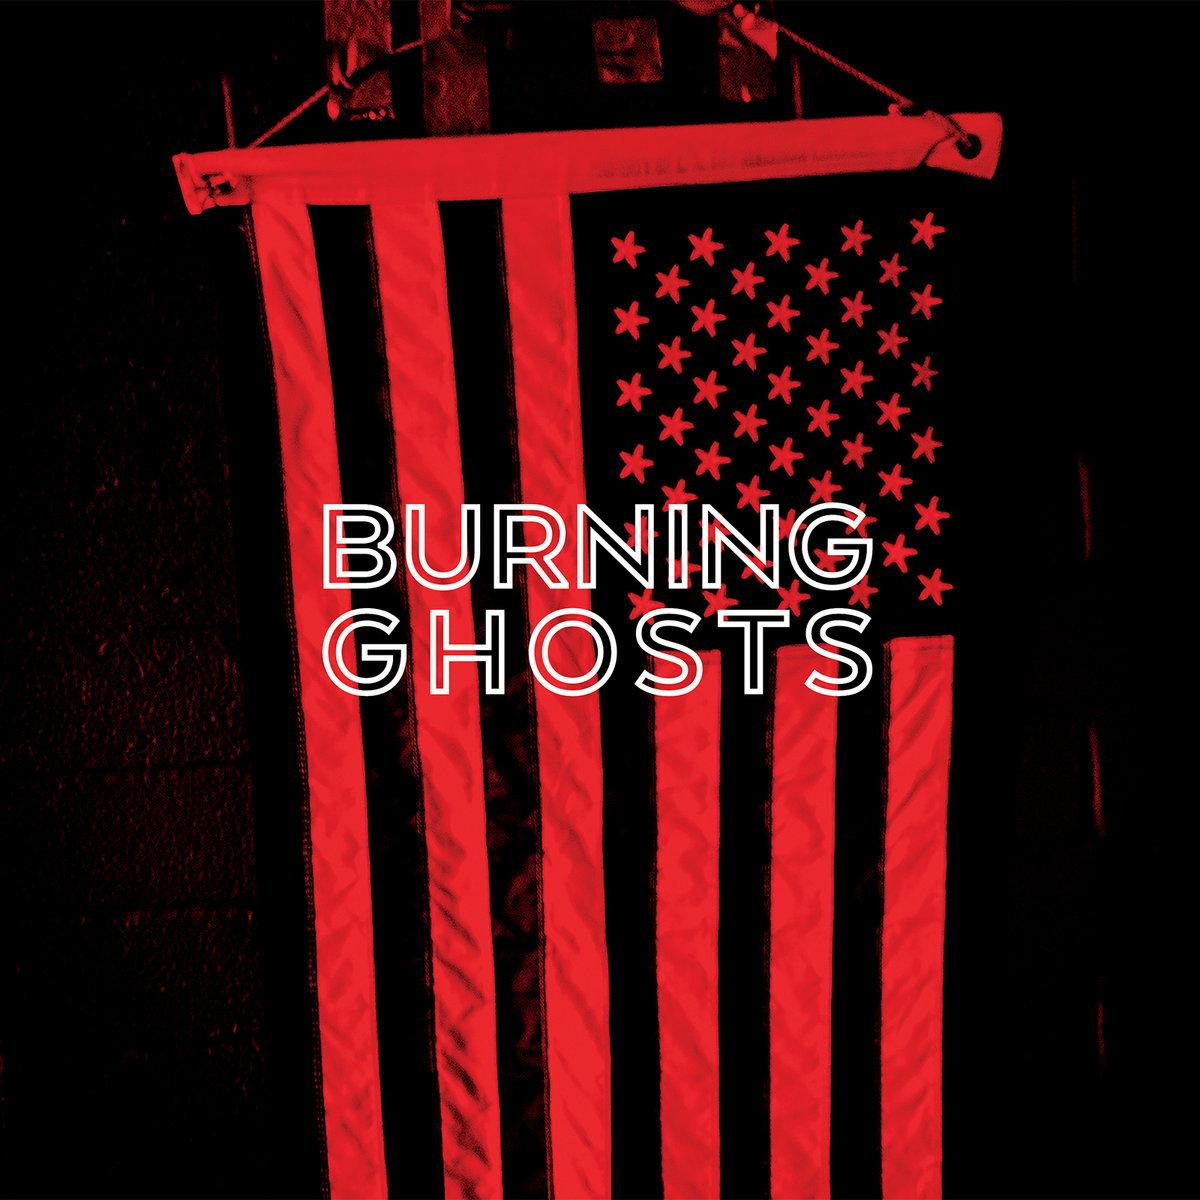 Burning Ghosts | Burning Ghosts